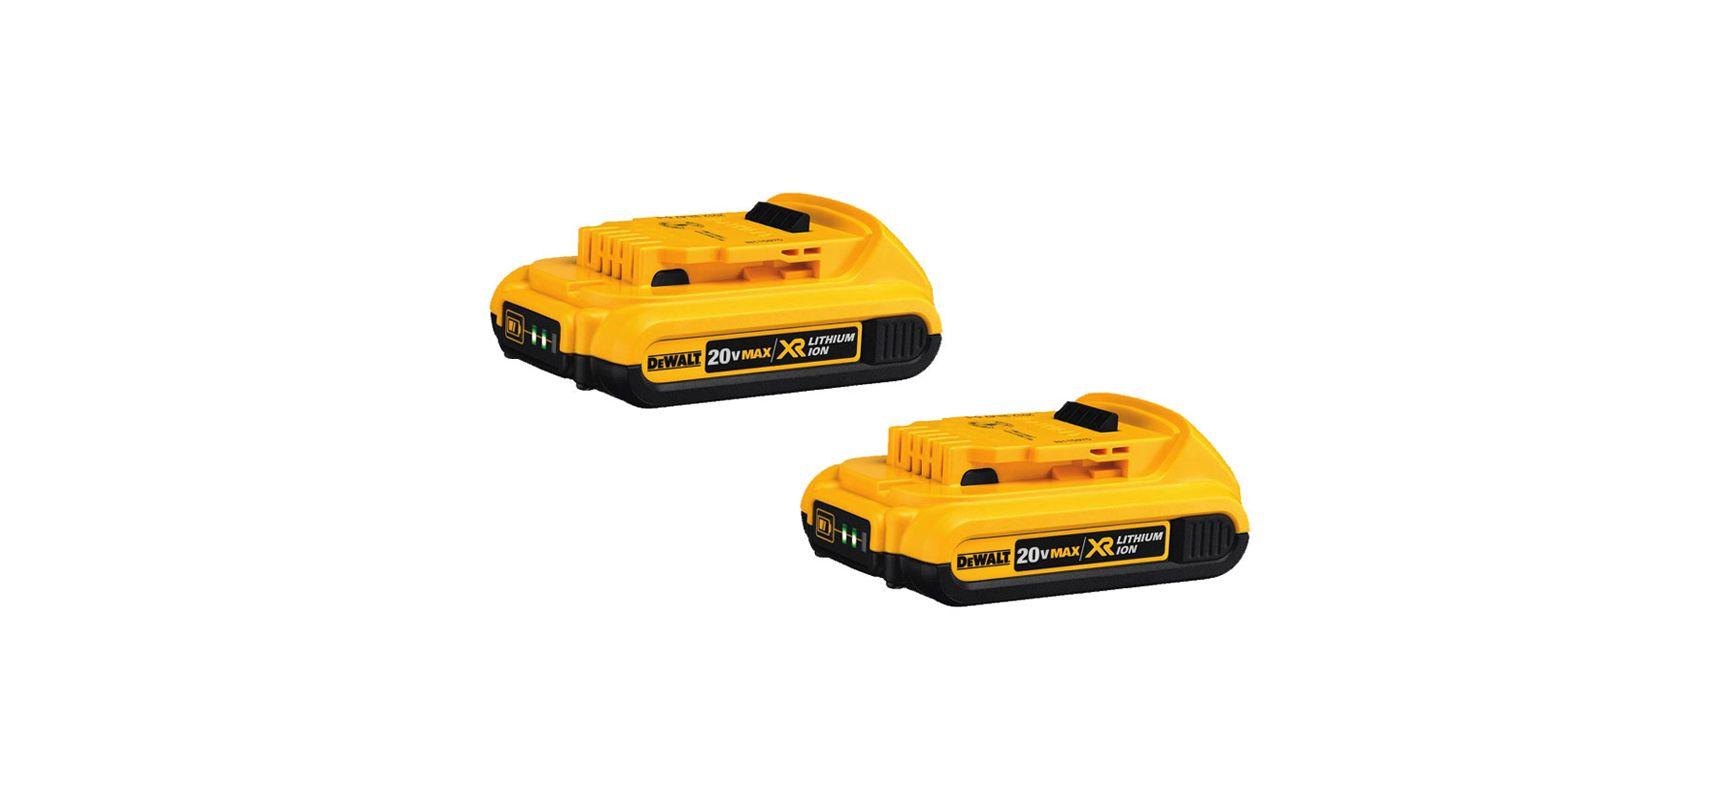 Aston 10 X 75 Wood Shed likewise Dewalt Battery also Ewrazphoto Nylon Sling Protector in addition 20ah 18v Battery For Dewalt De9503 P 2316 besides Showthread. on de walt 18 volt to 20 battery adapter